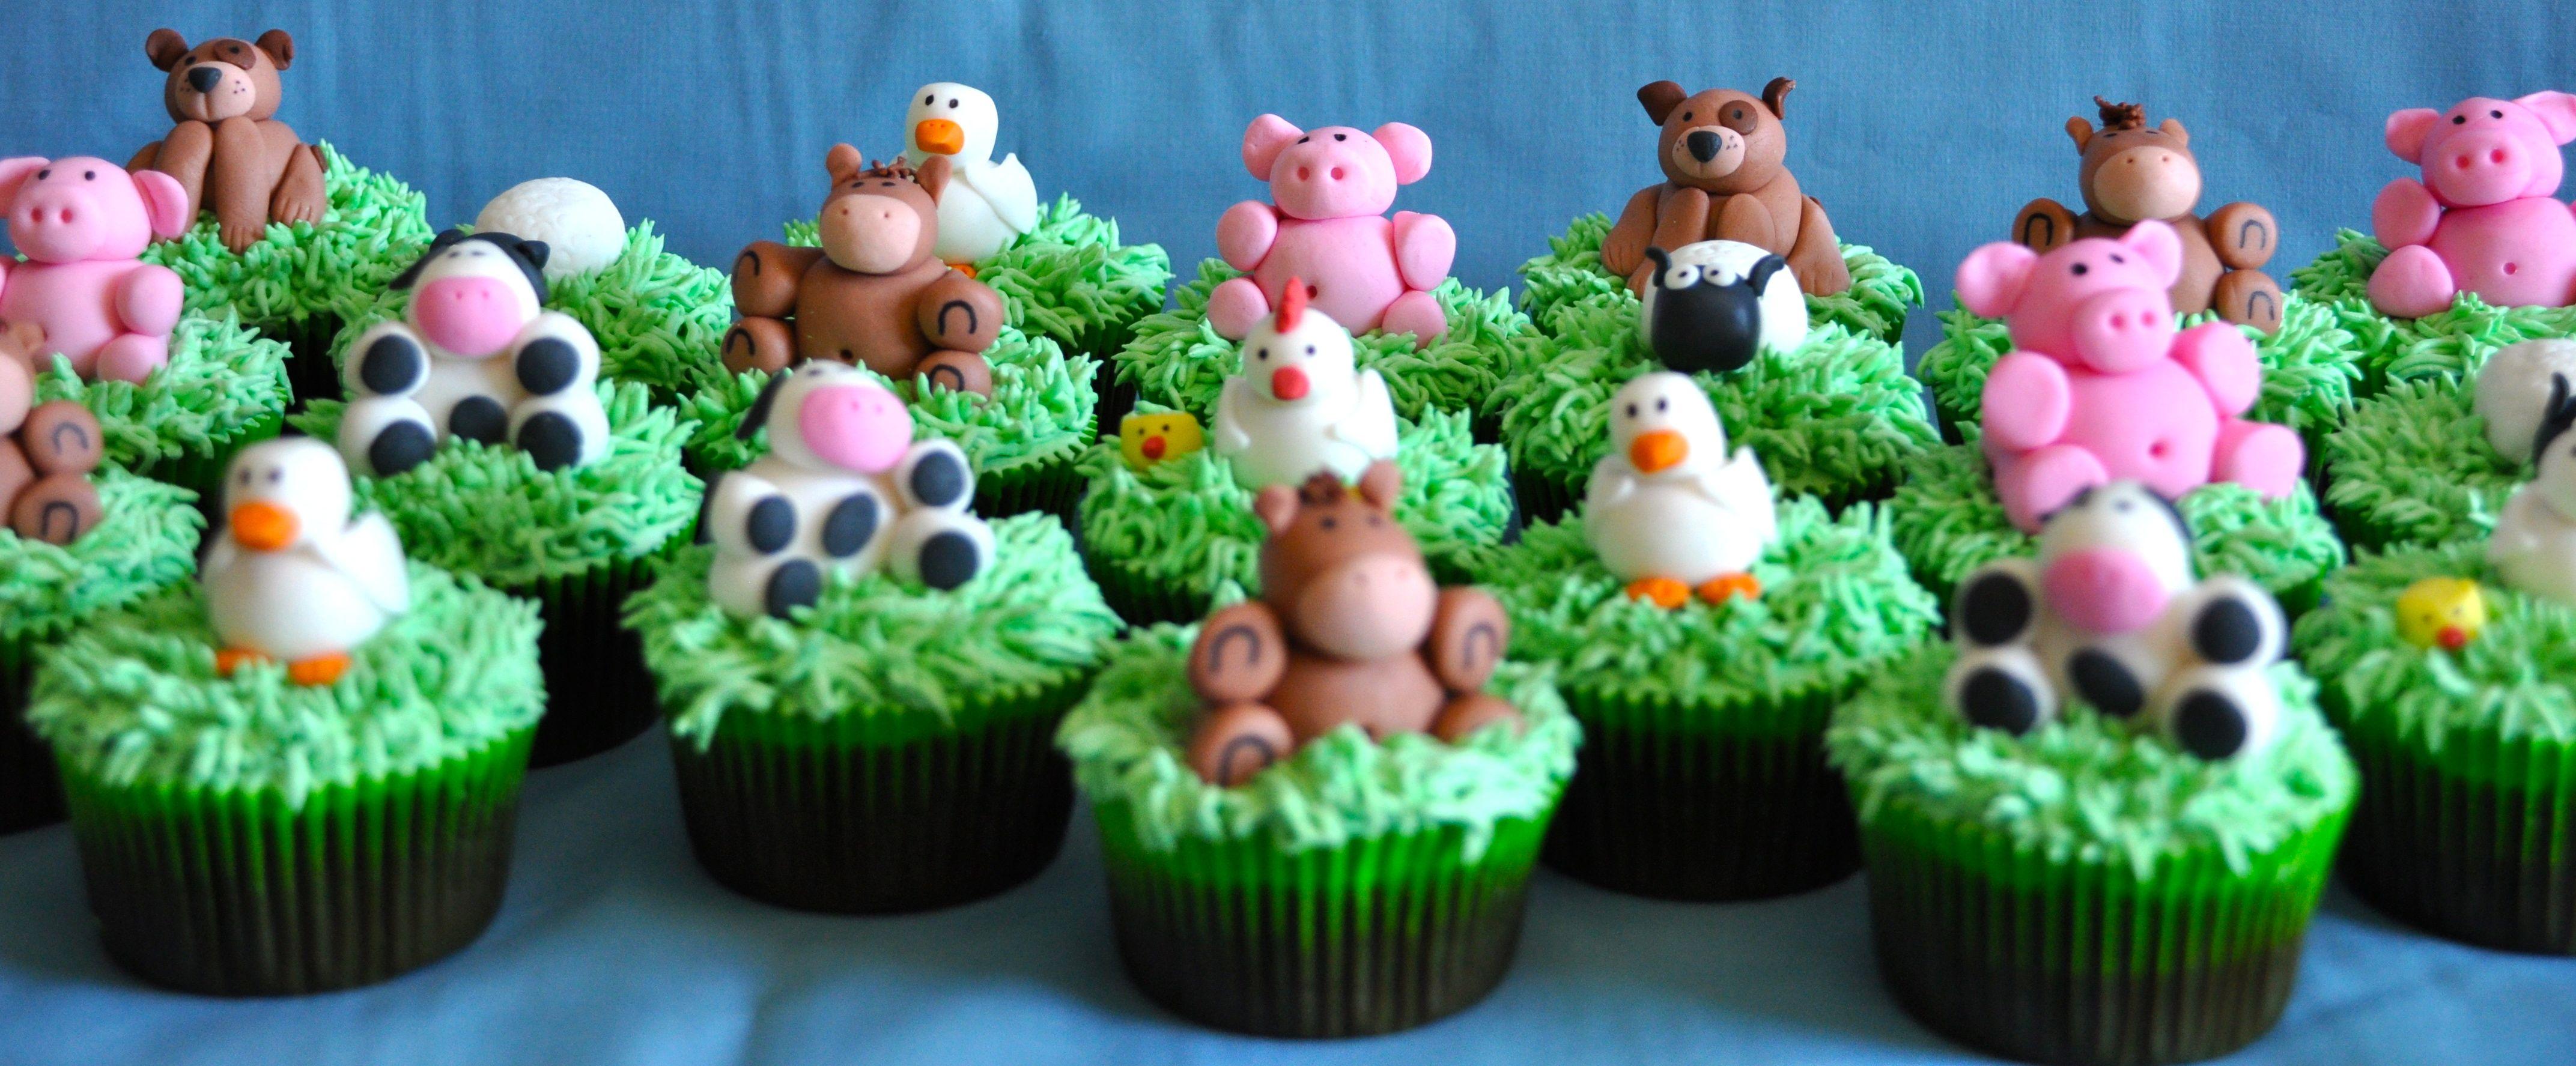 Farm animal cupcakes cupcakes for kids pinterest